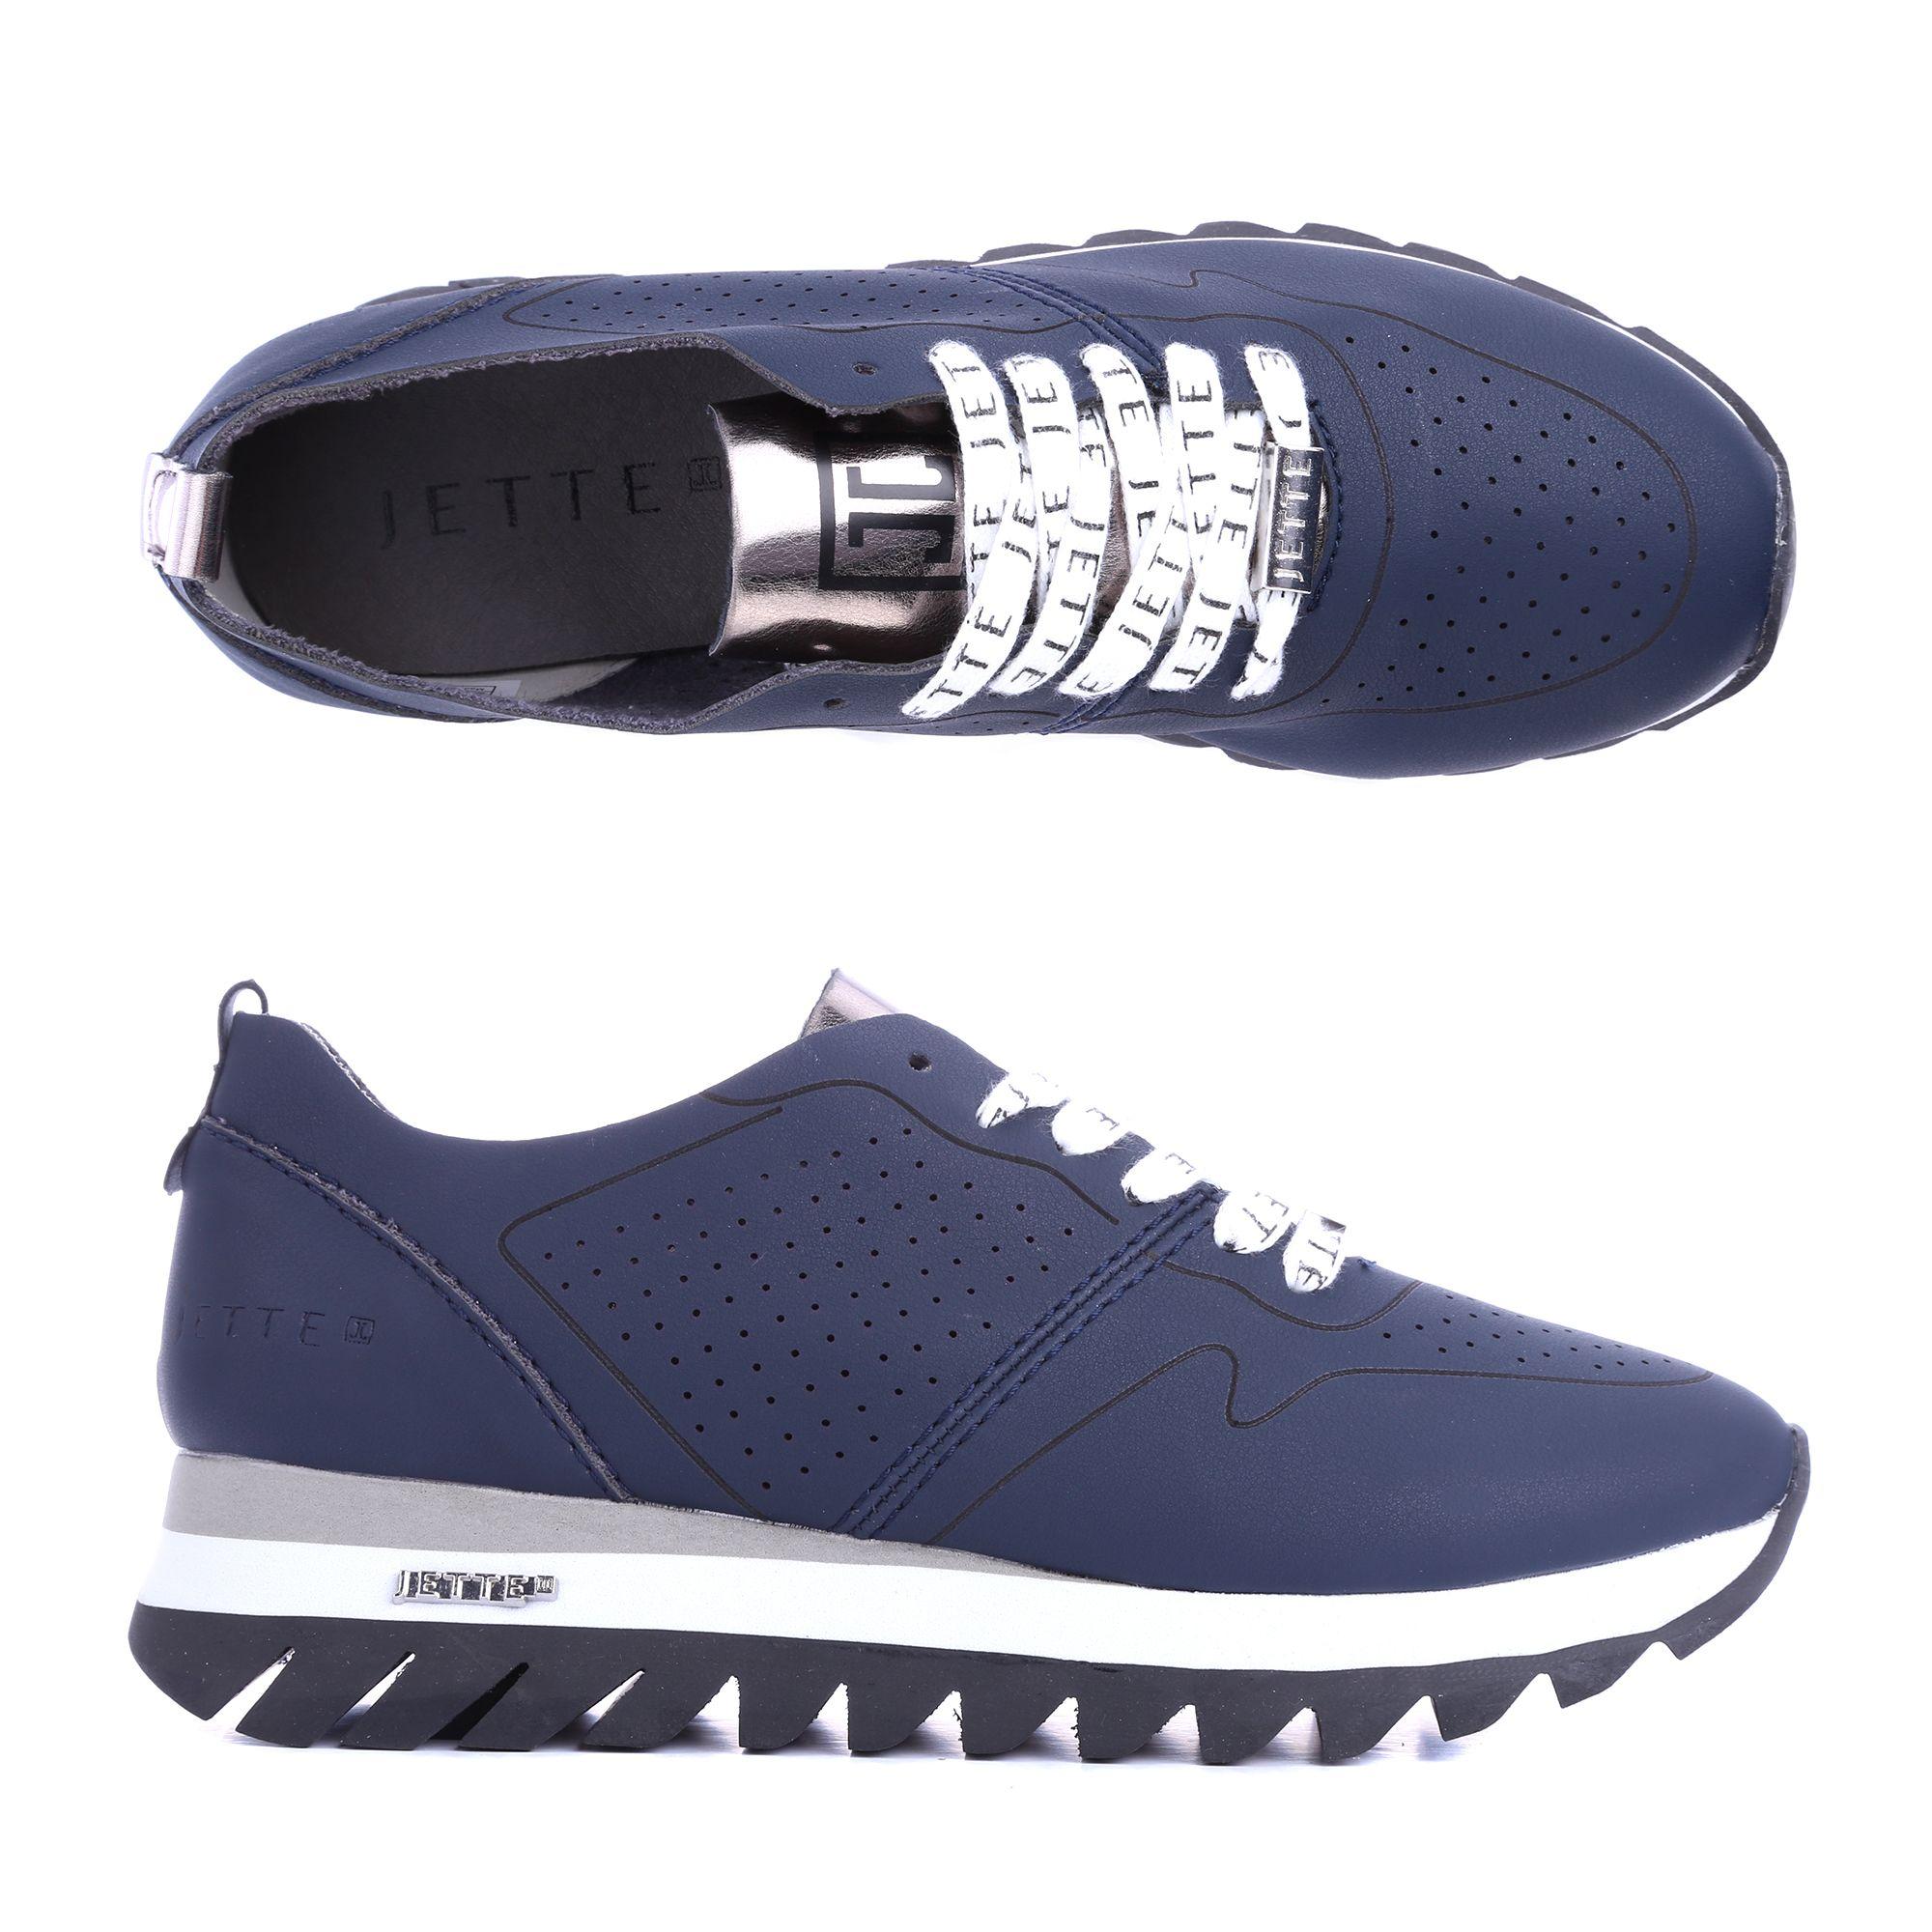 sale retailer 4b13a c2028 JETTE Damen-Sneaker Lederimitat Logosenkel Haifischsohle — QVC.de